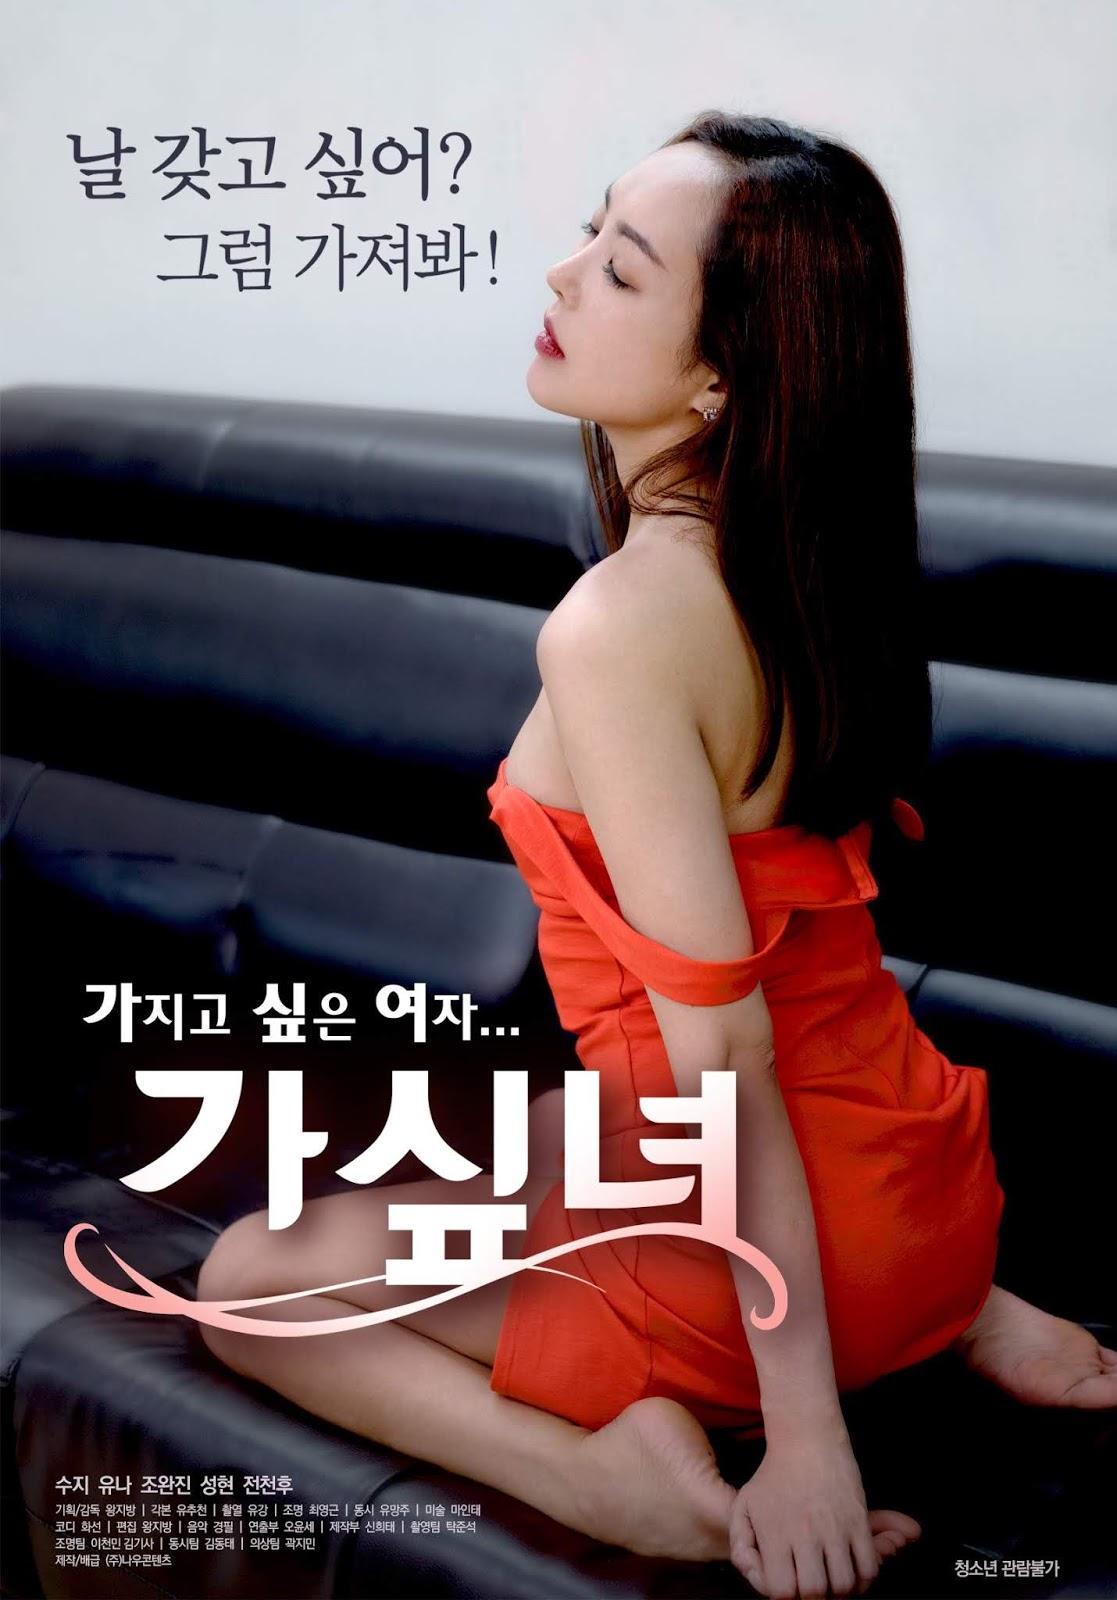 Gossip Girl Full Korea 18+ Adult Movie Online Free